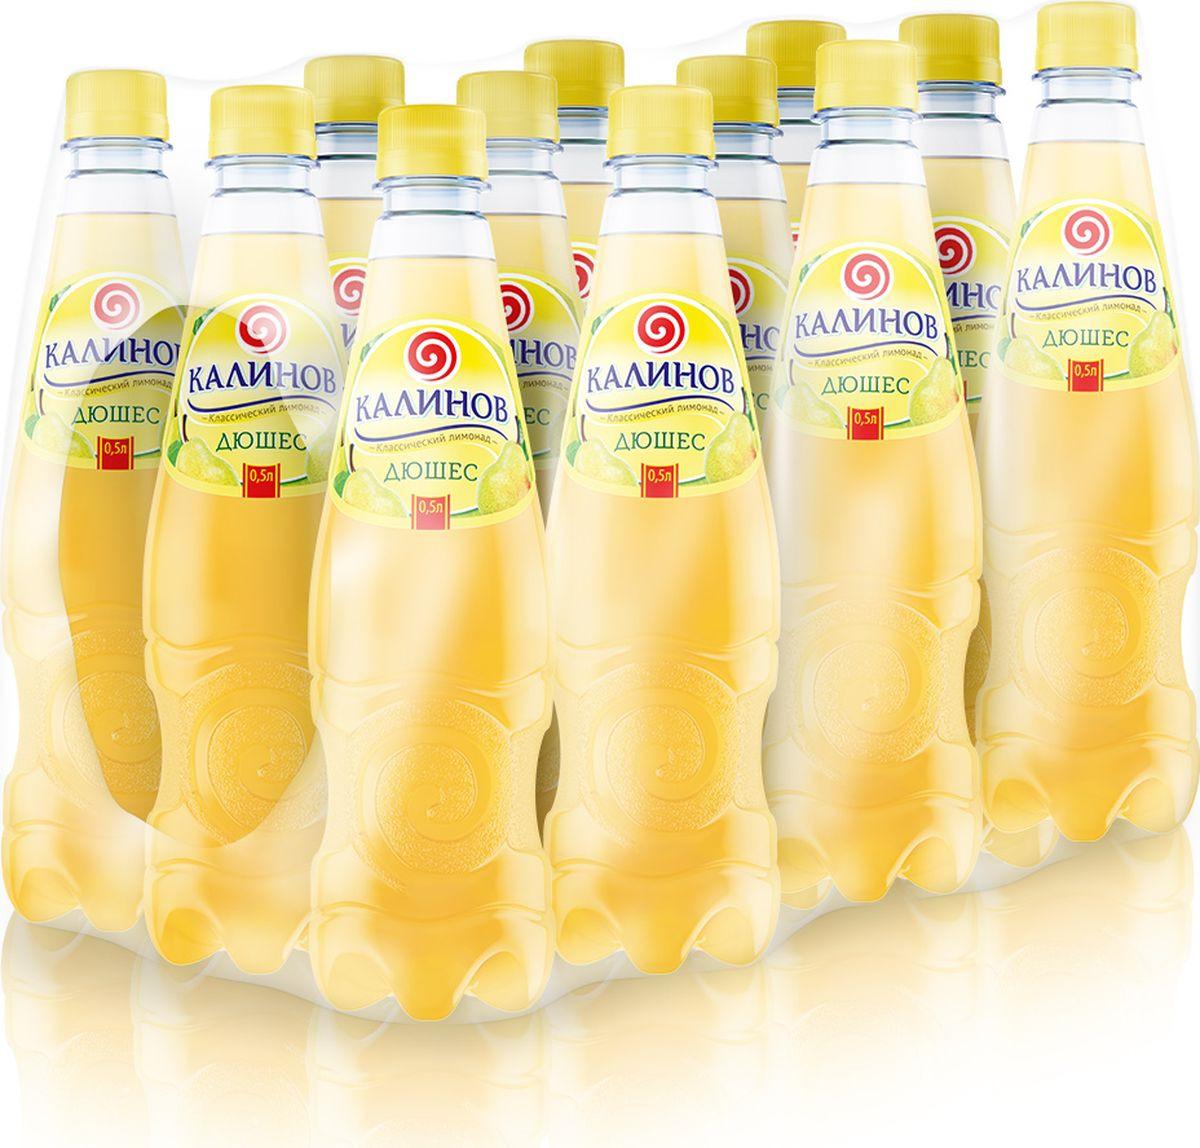 Калинов Лимонад Дюшес, 12 шт по 0,5 л лимонад калинов родник дюшес 6 шт по 1 5 л